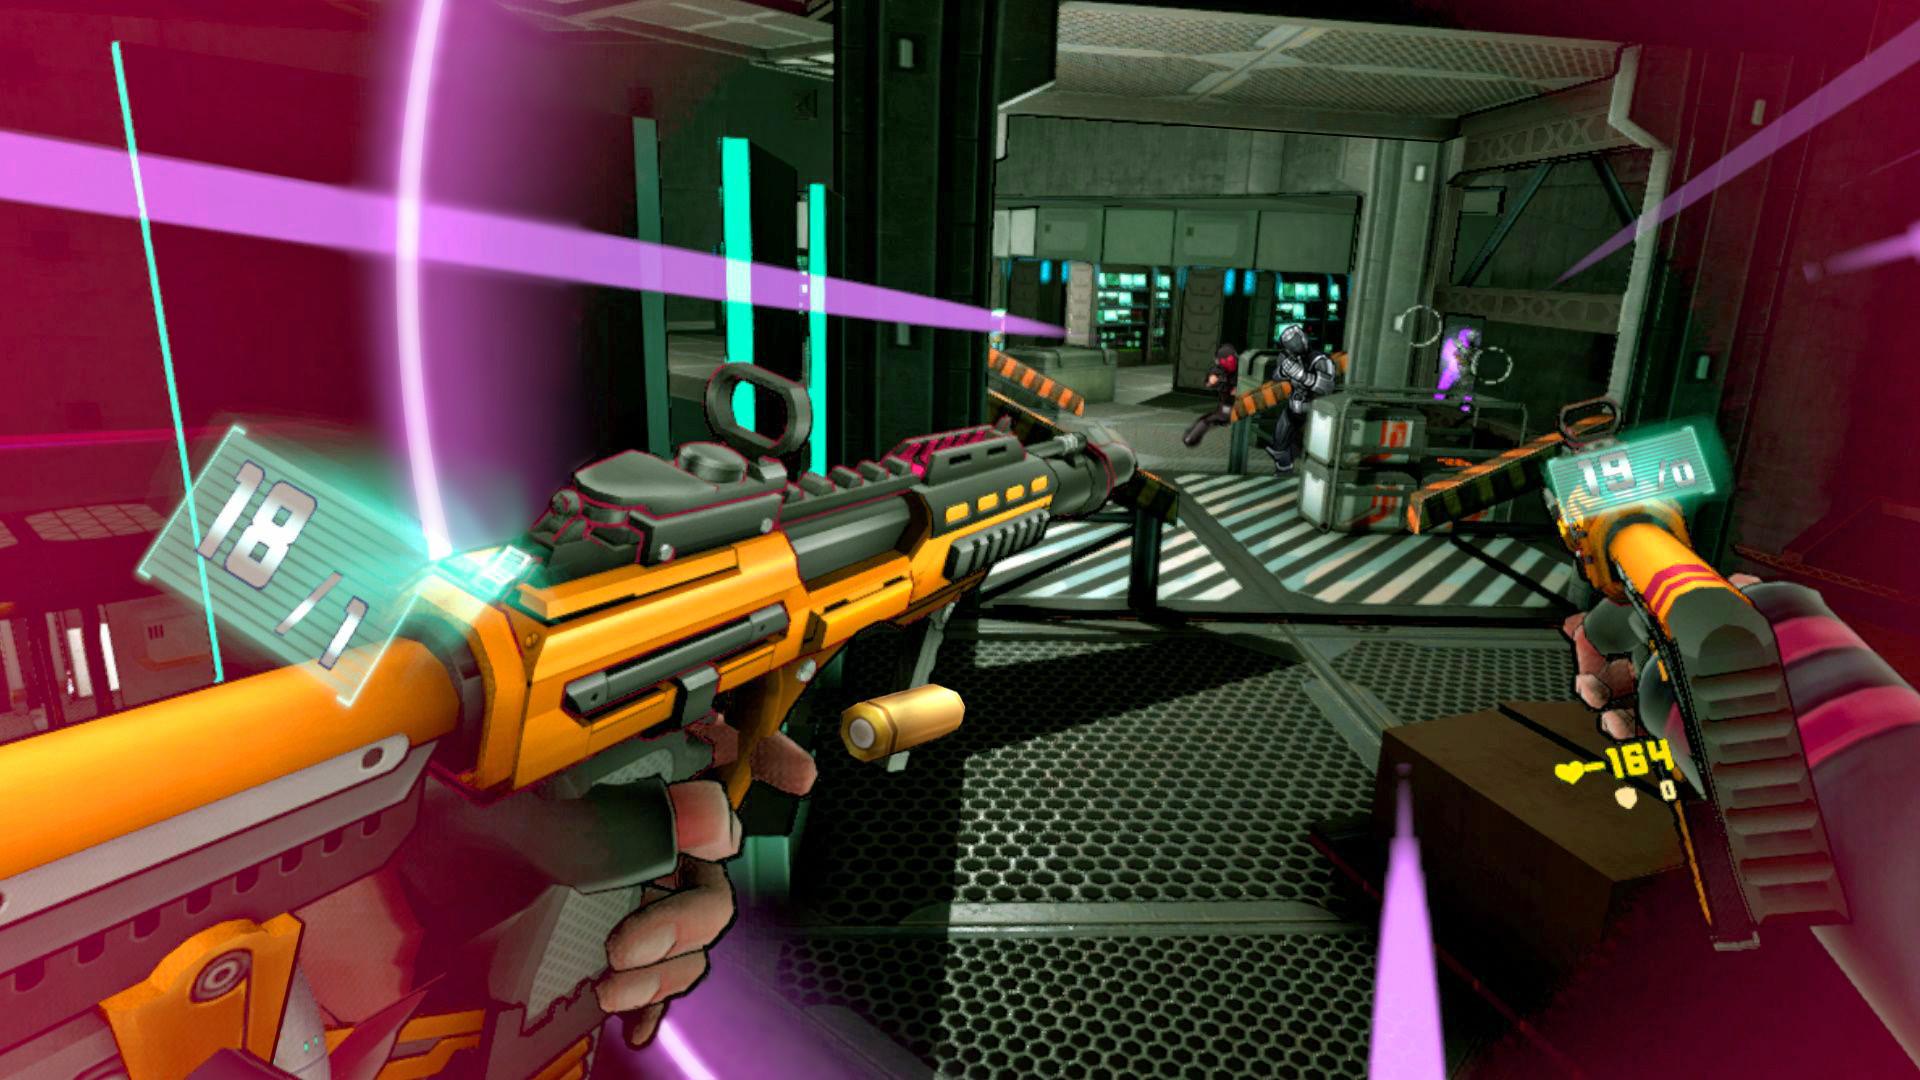 Wanted-Killer-VR-SteamVR-HTC-Vive